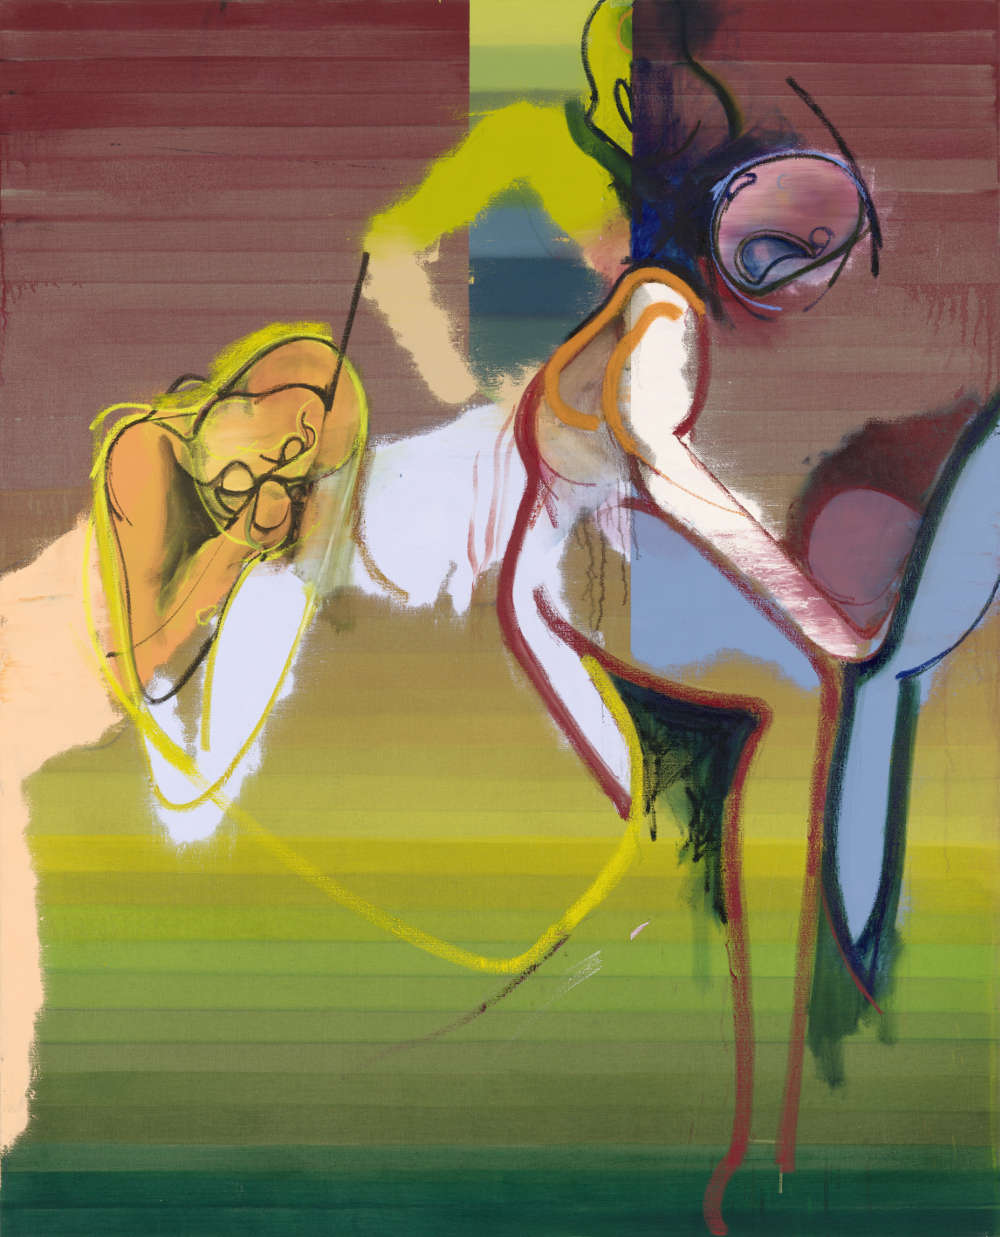 Daniel Richter, What was her name, 2018. Oil on canvas 210 x 170 cm (82,68 x 66,93 in) © Daniel Richter/DACS, London 2018. Photo: Jochen Littkemann. Courtesy Galerie Thaddaeus Ropac, London · Paris · Salzburg